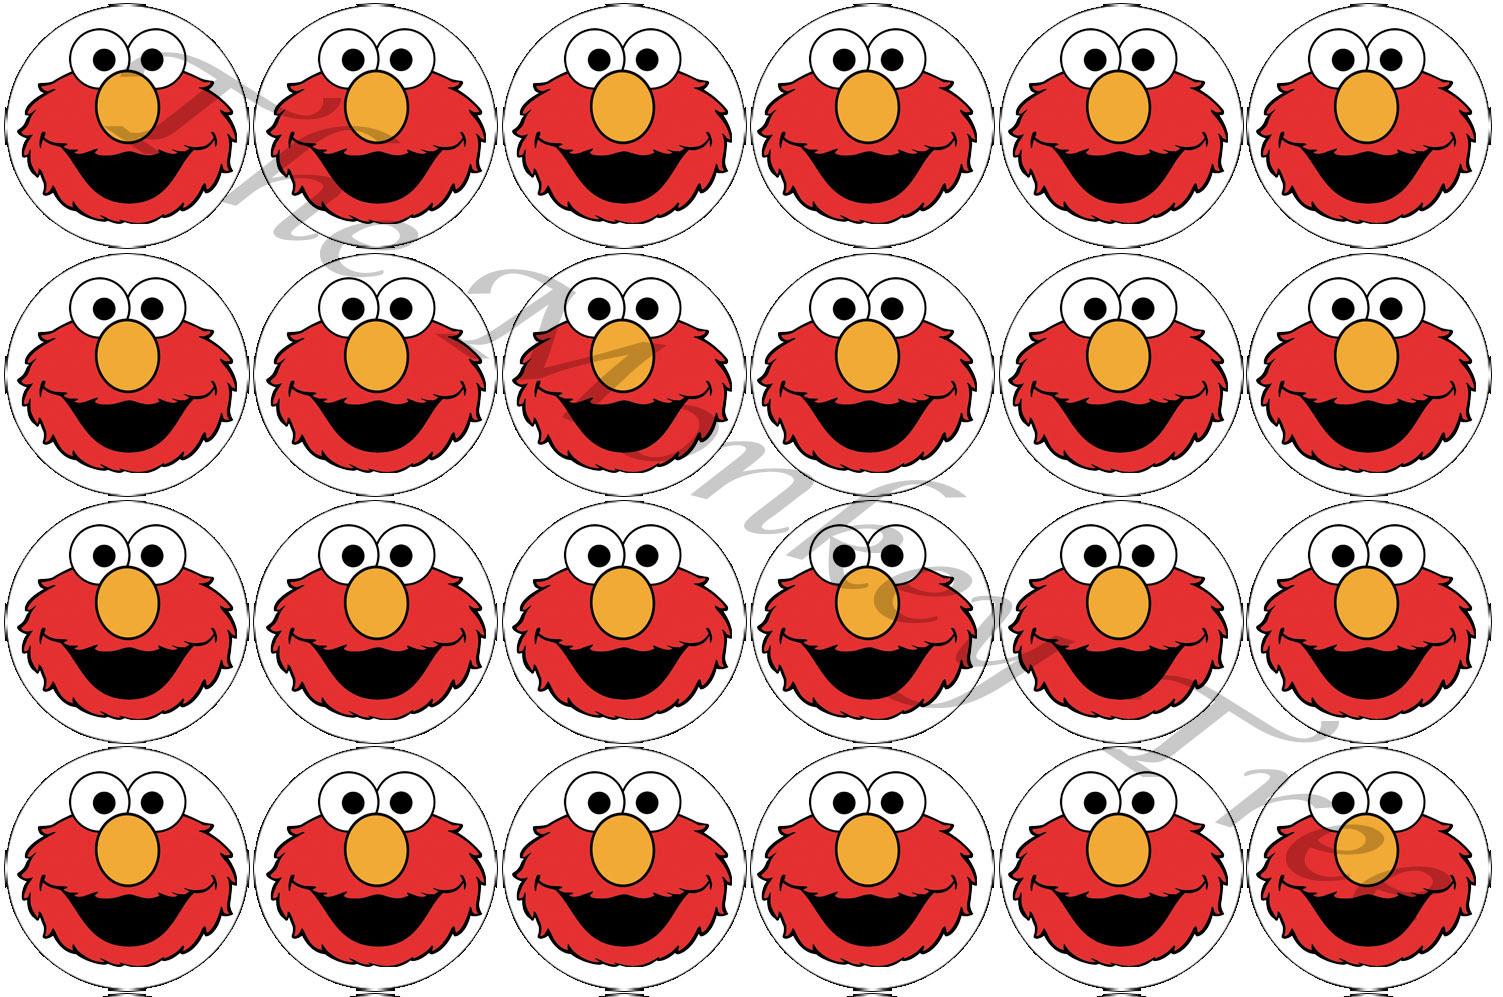 Elmo Face Edible Cupcake Topper Birthday Party Cake Image Fondant